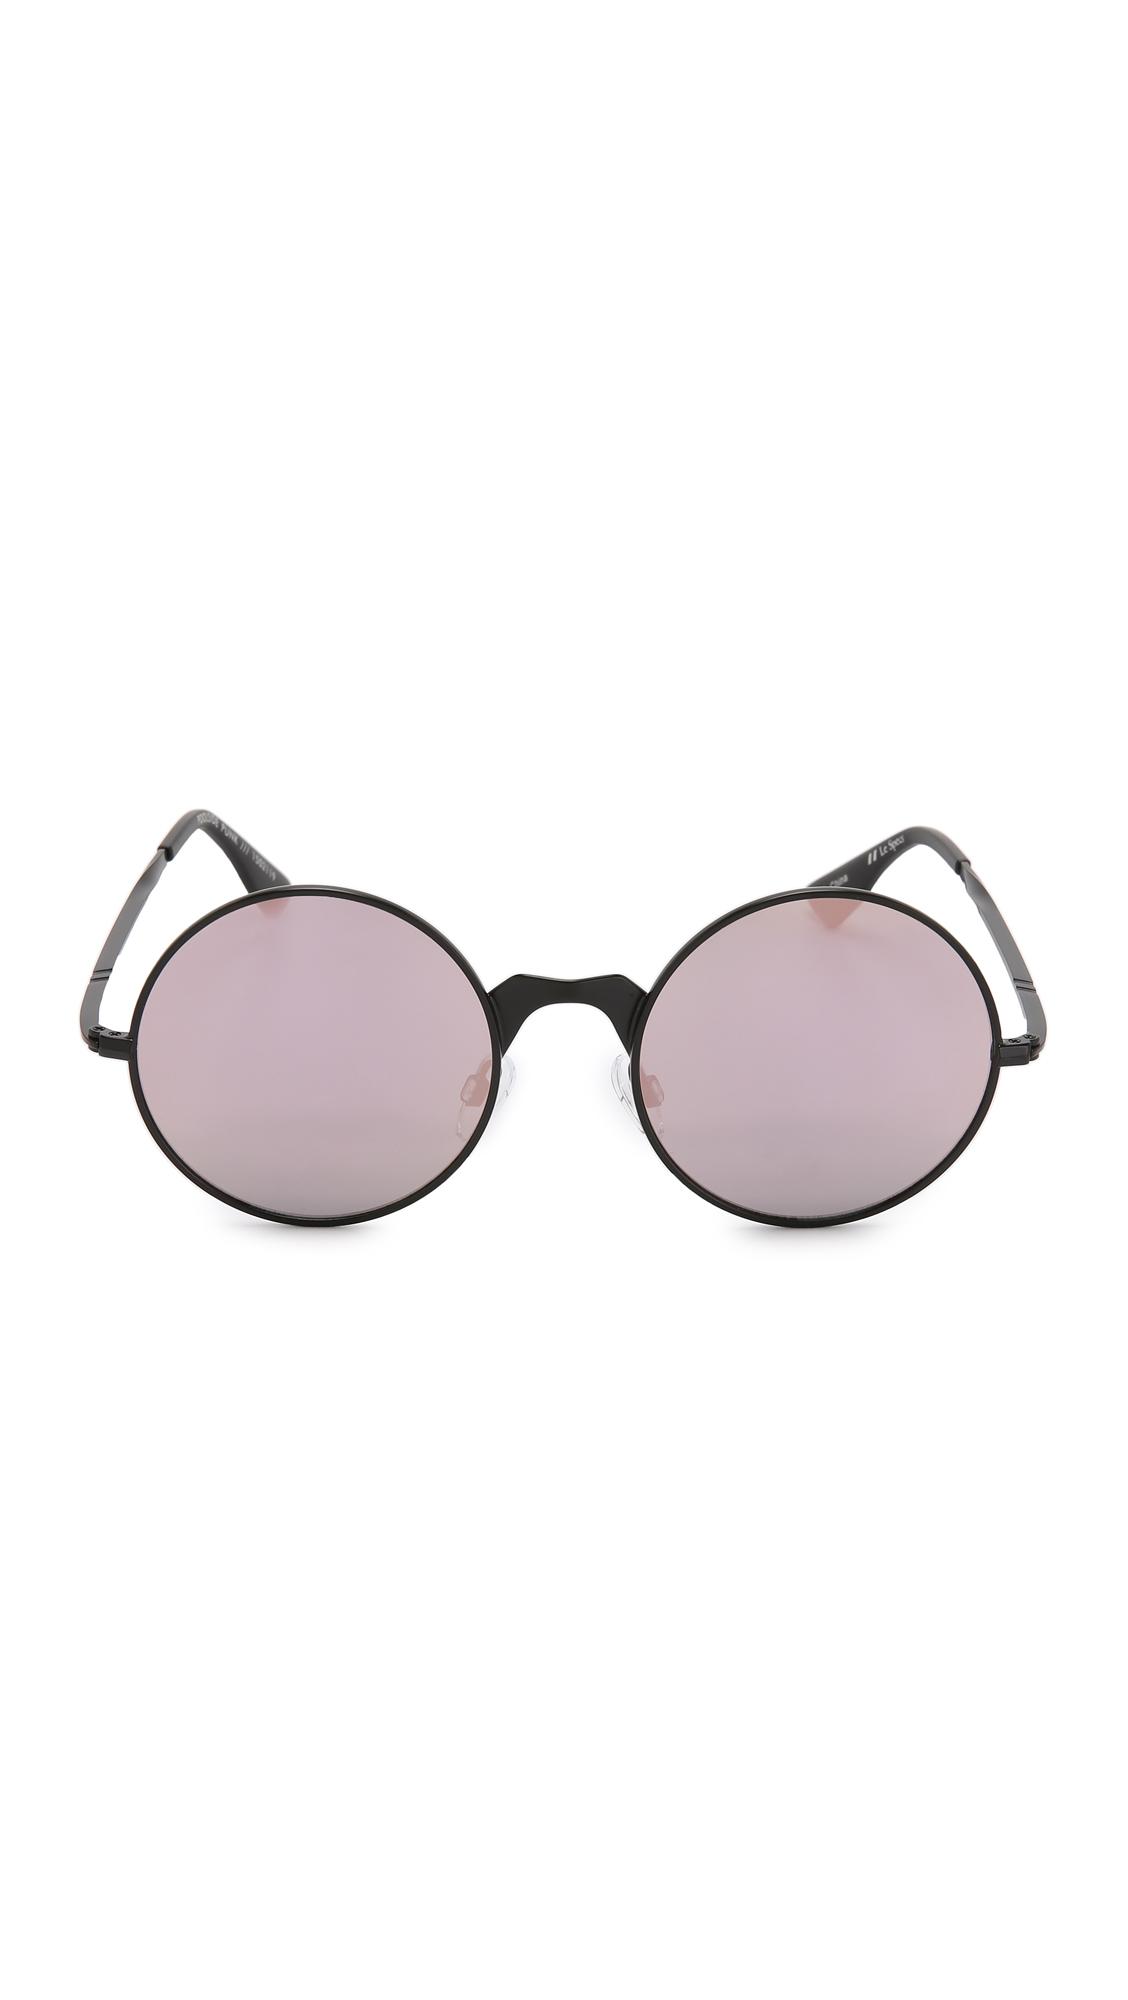 Le Specs Poolside Punk Sonnenbrille Schwarz Poolside Punk 55mm oLrRbuDh